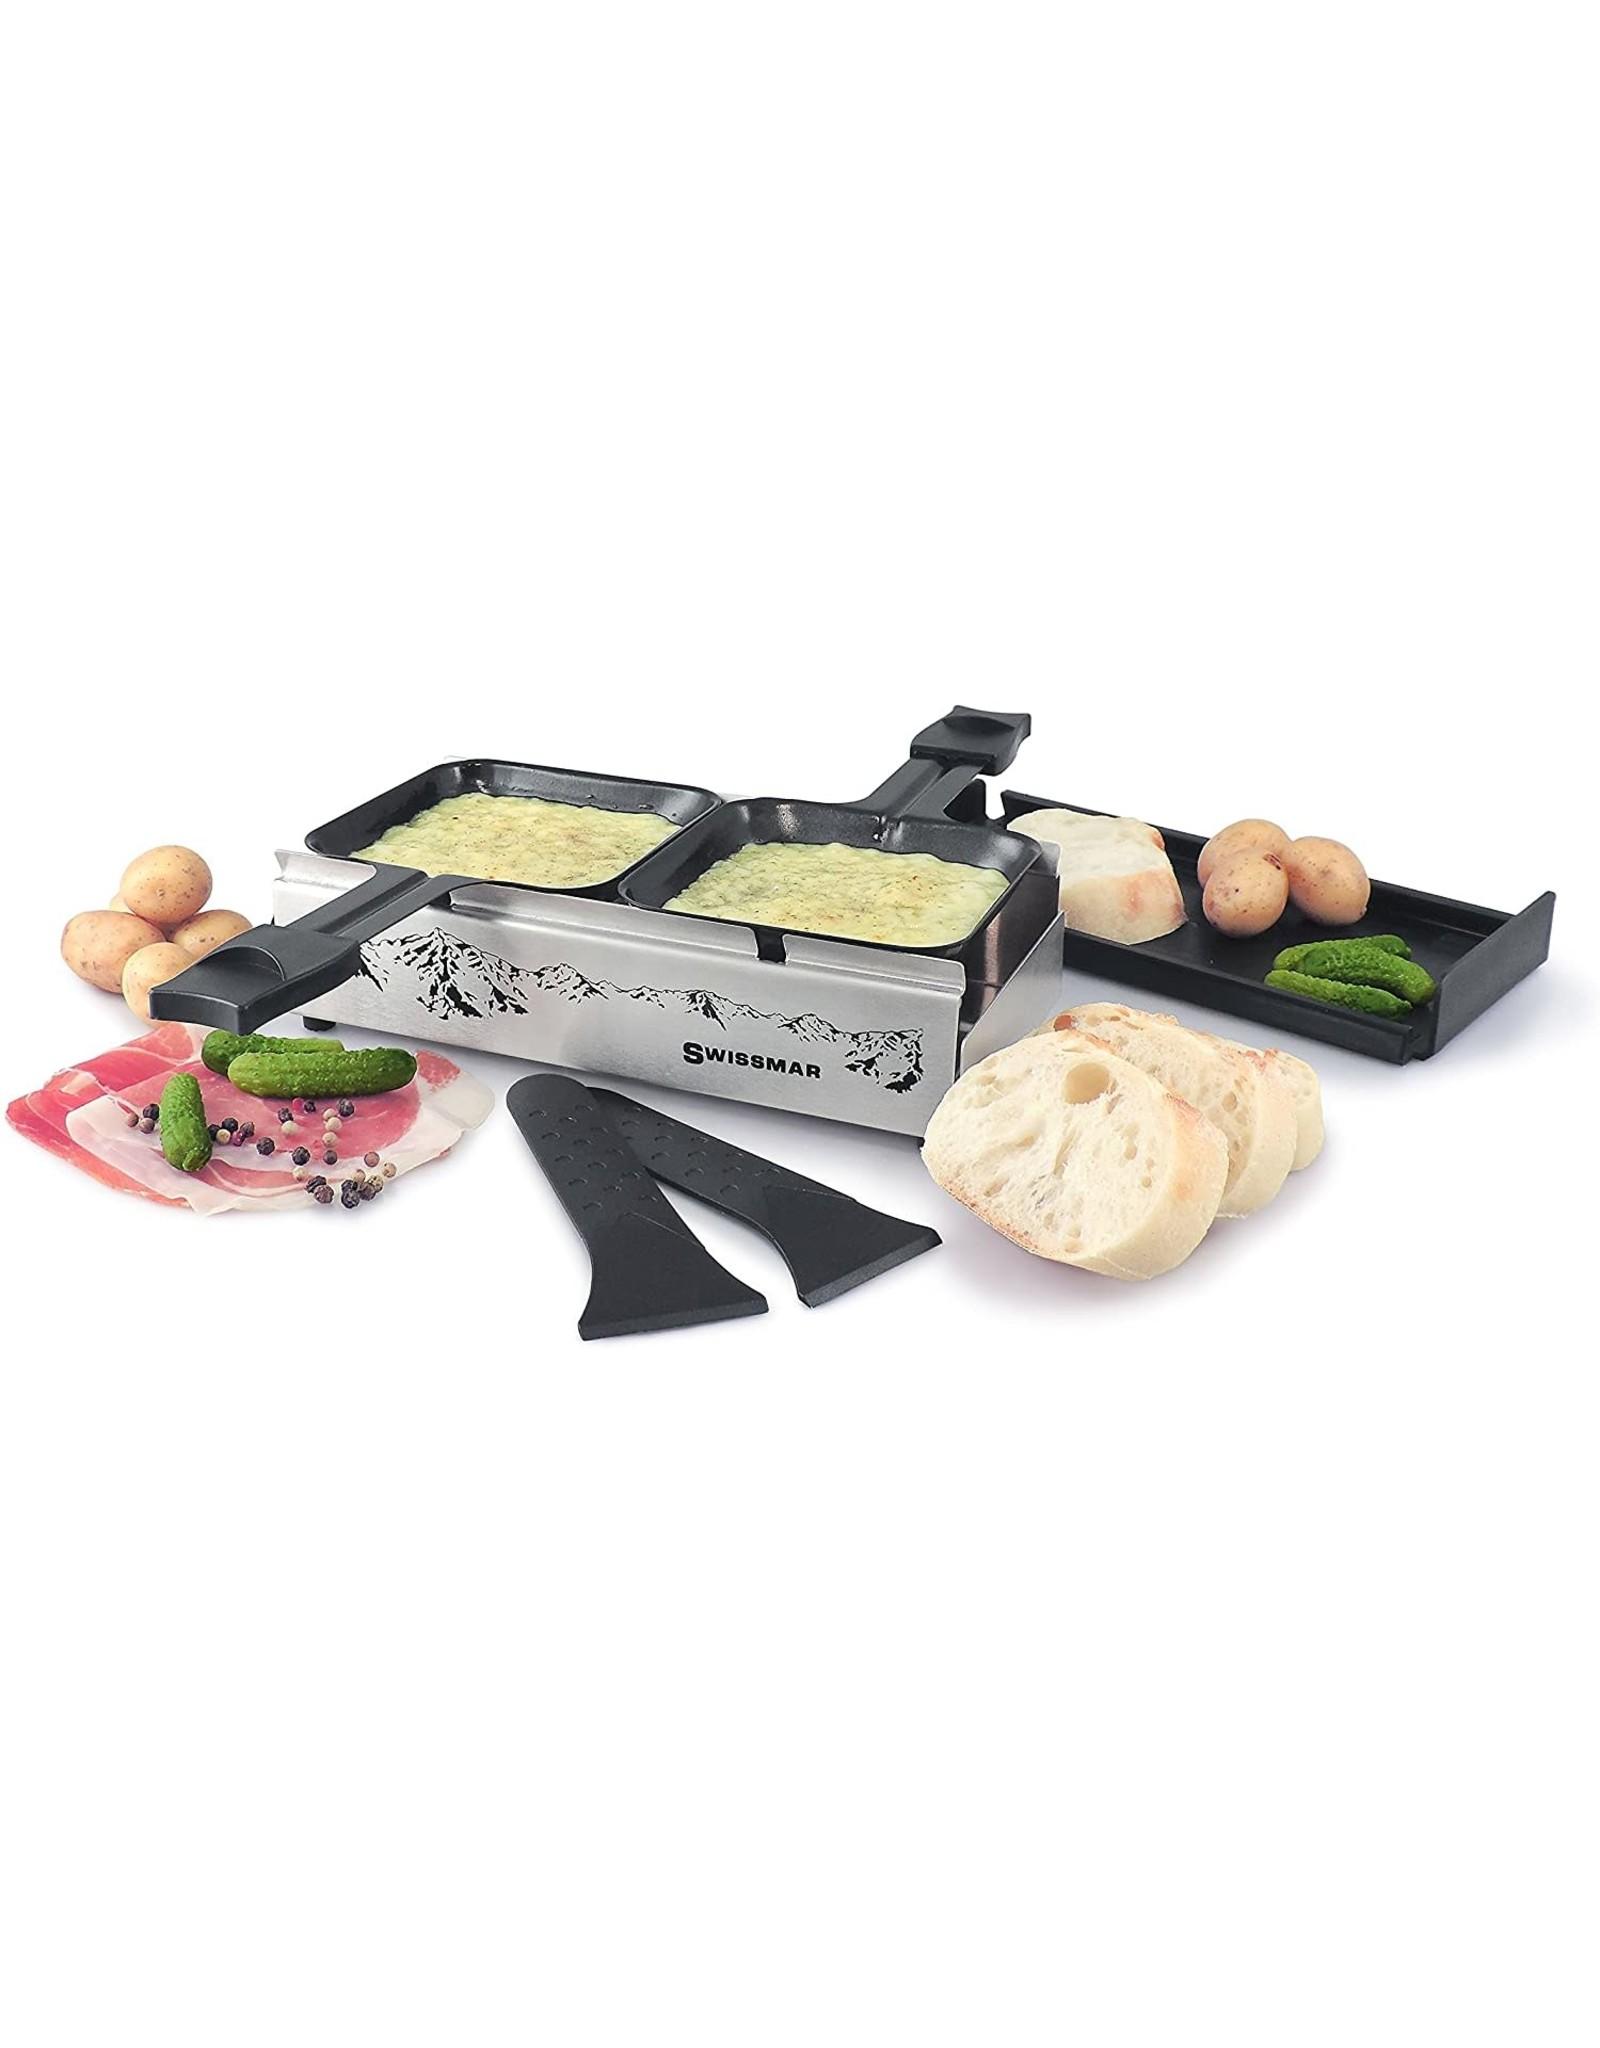 Swissmar Alpine raclette